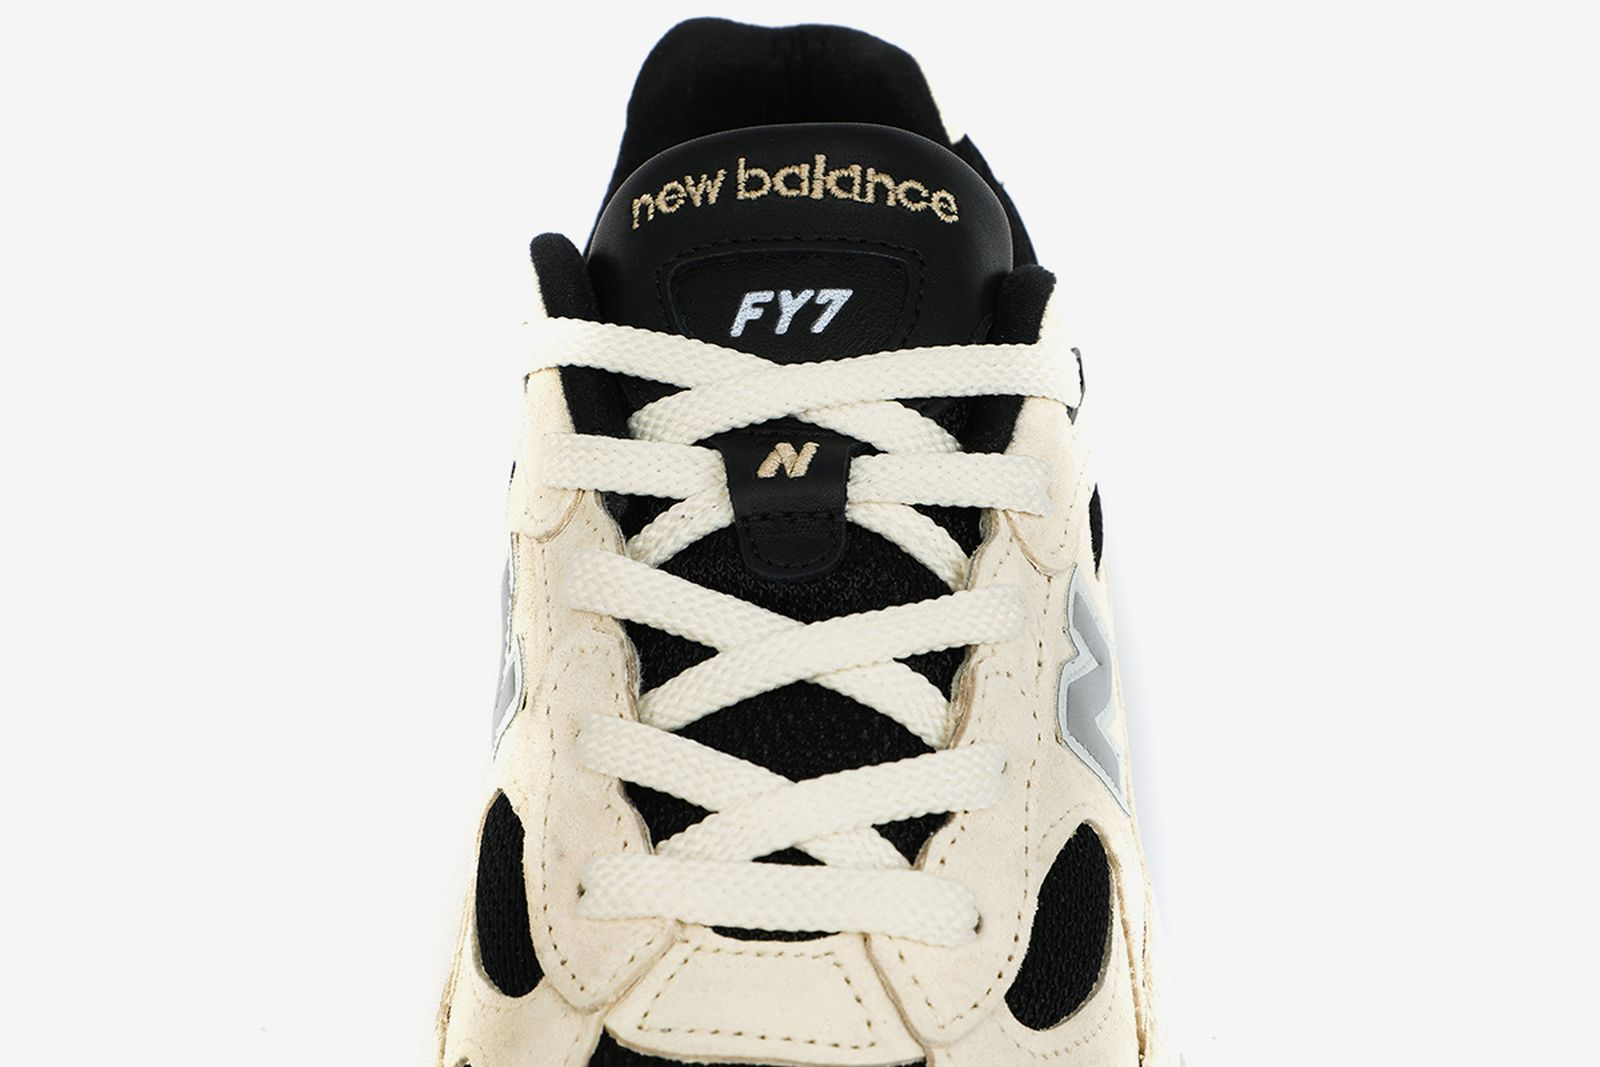 Studio FY7 x New Balance 992